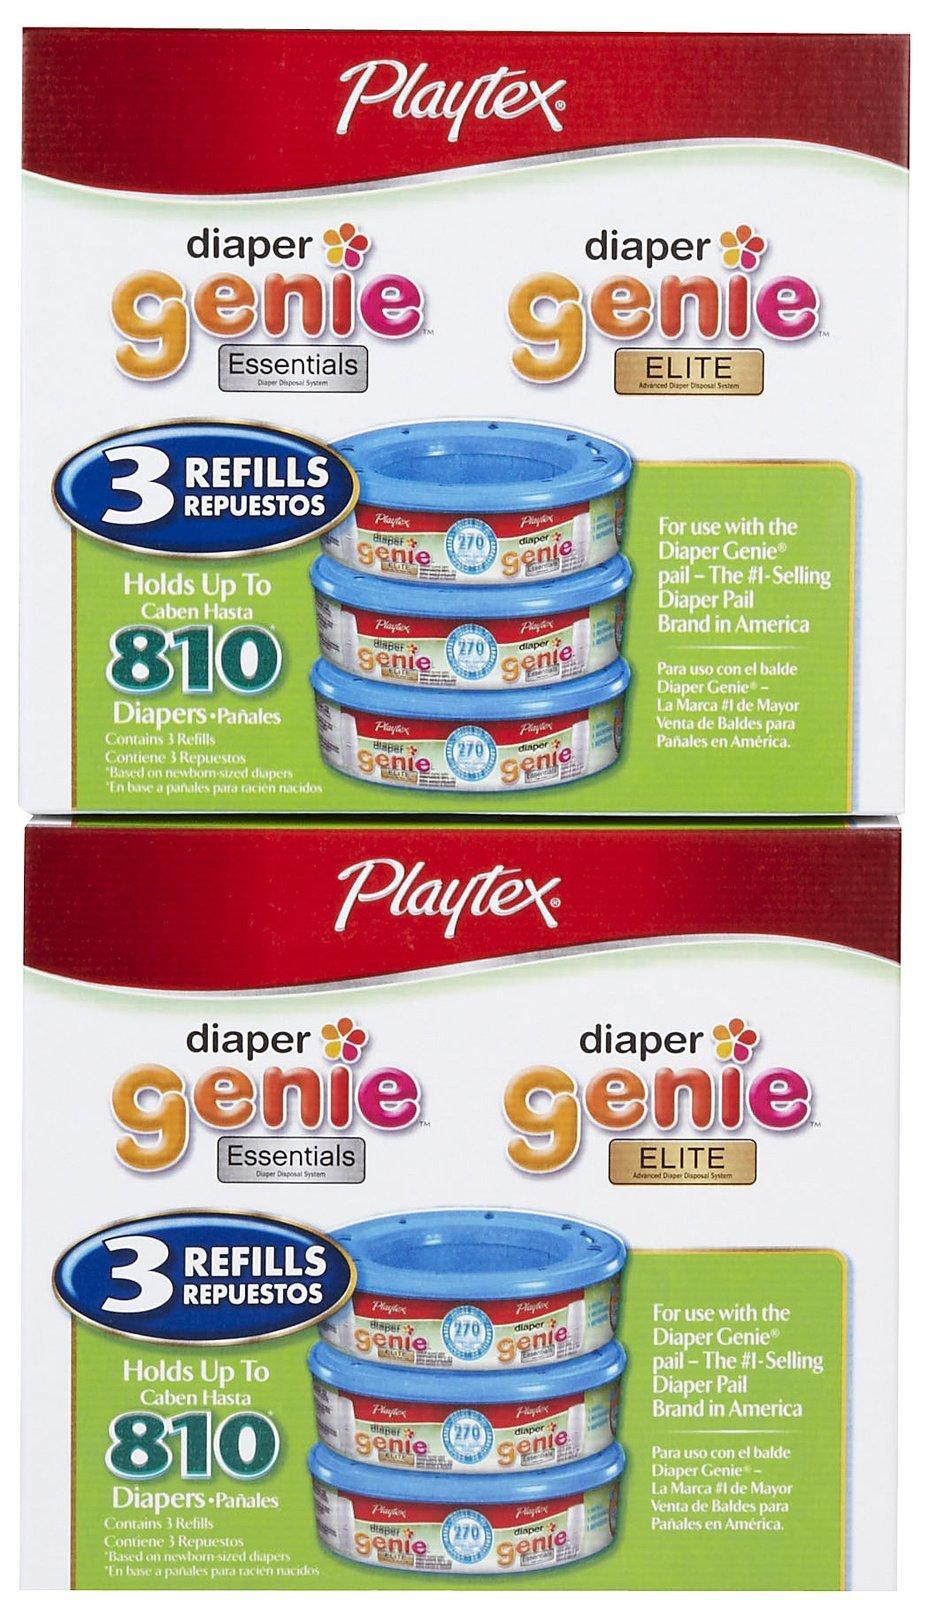 Playtex Diaper Genie Refill - 6 pk